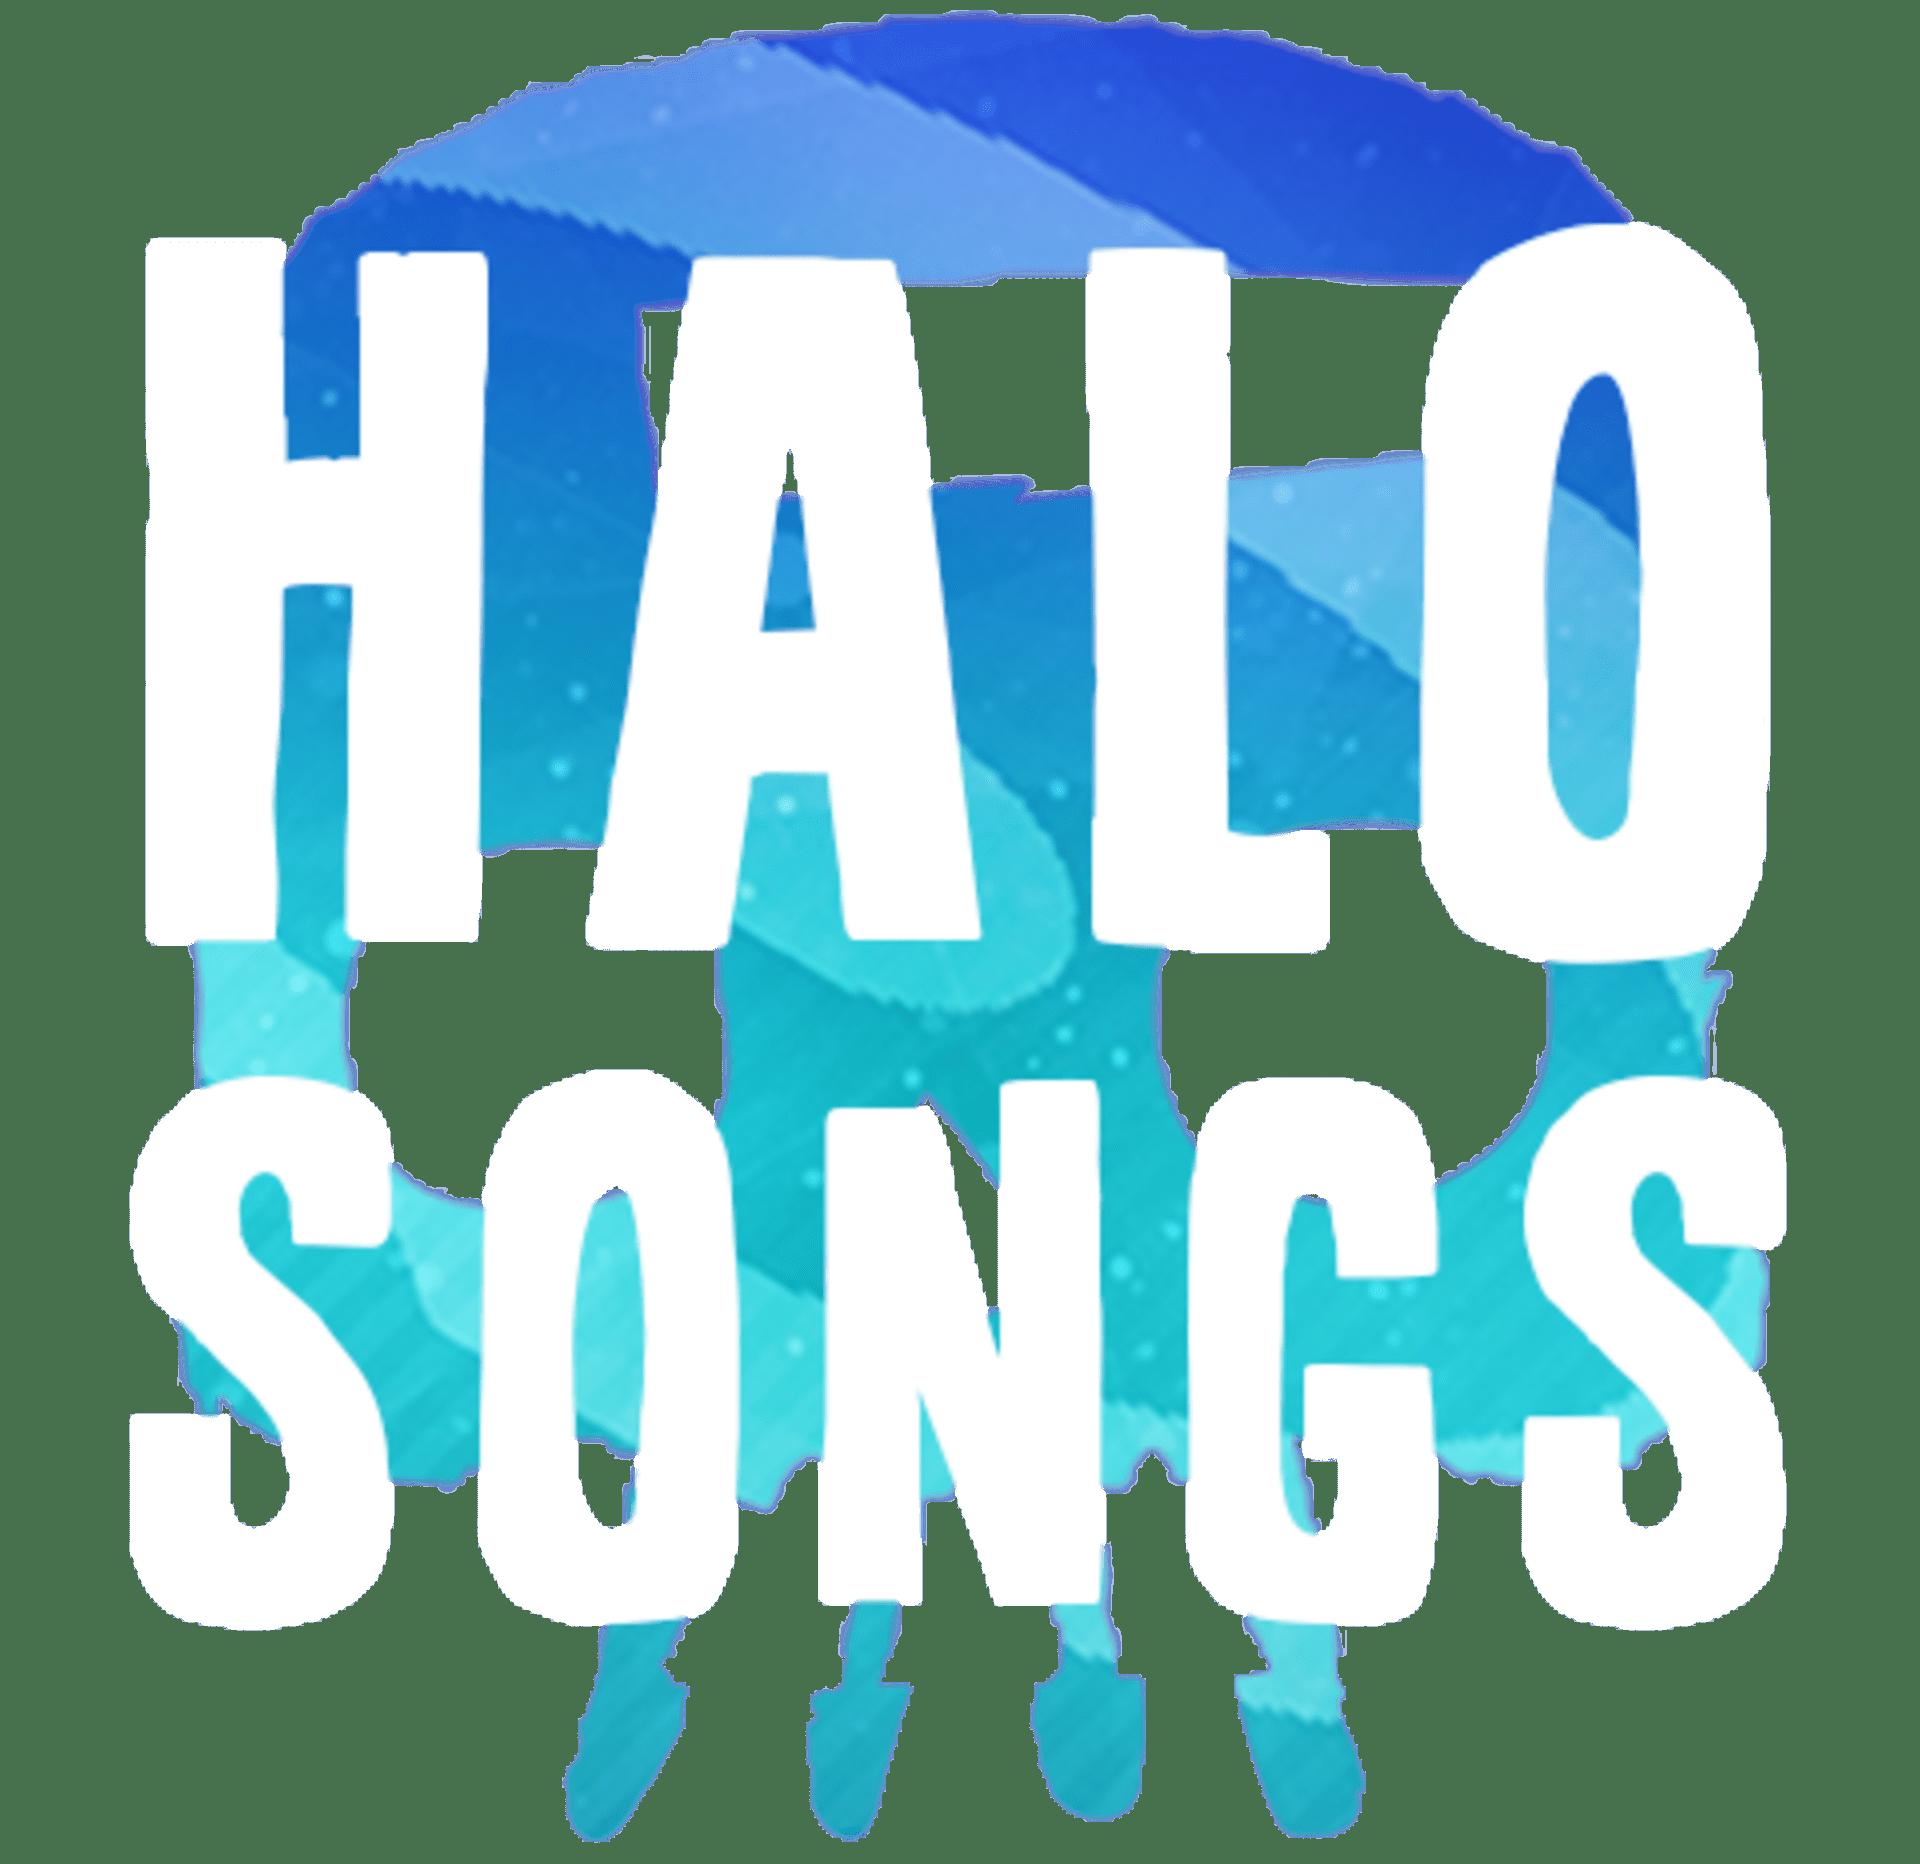 Halo 3 Song Parody -